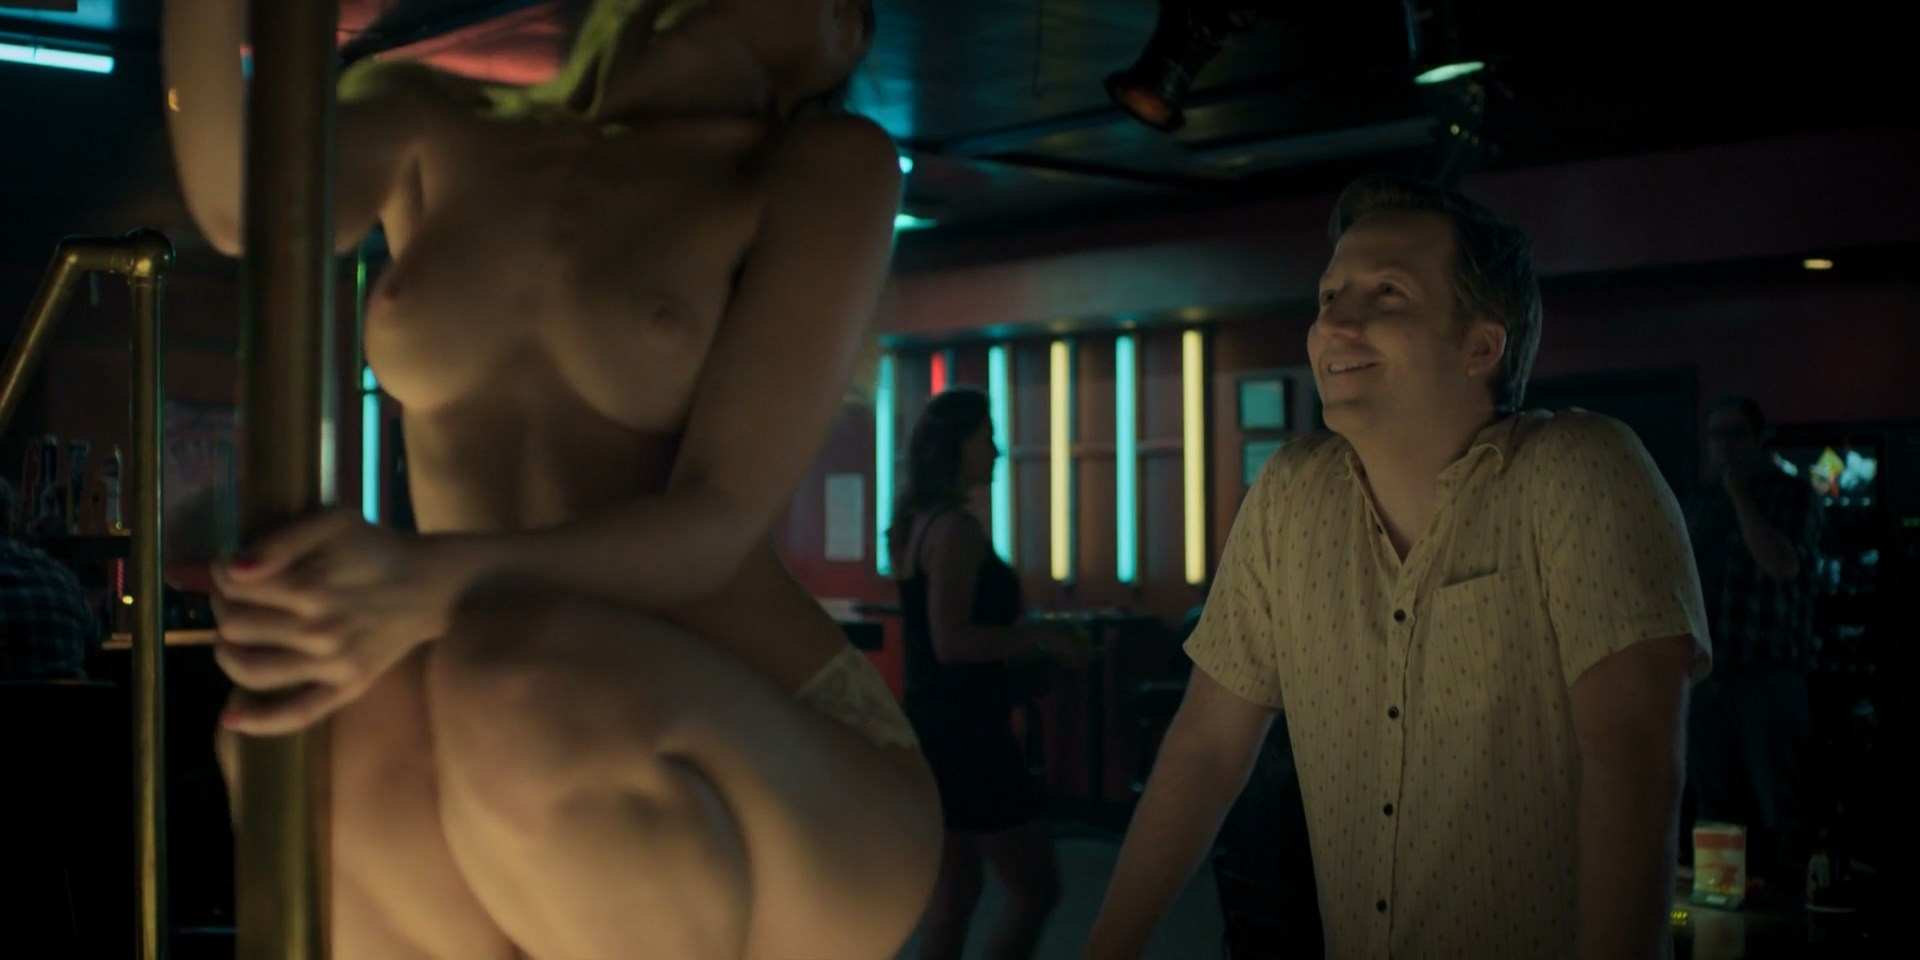 Melissa Saint-Amand nude - Ozark s02e08-09 (2018)